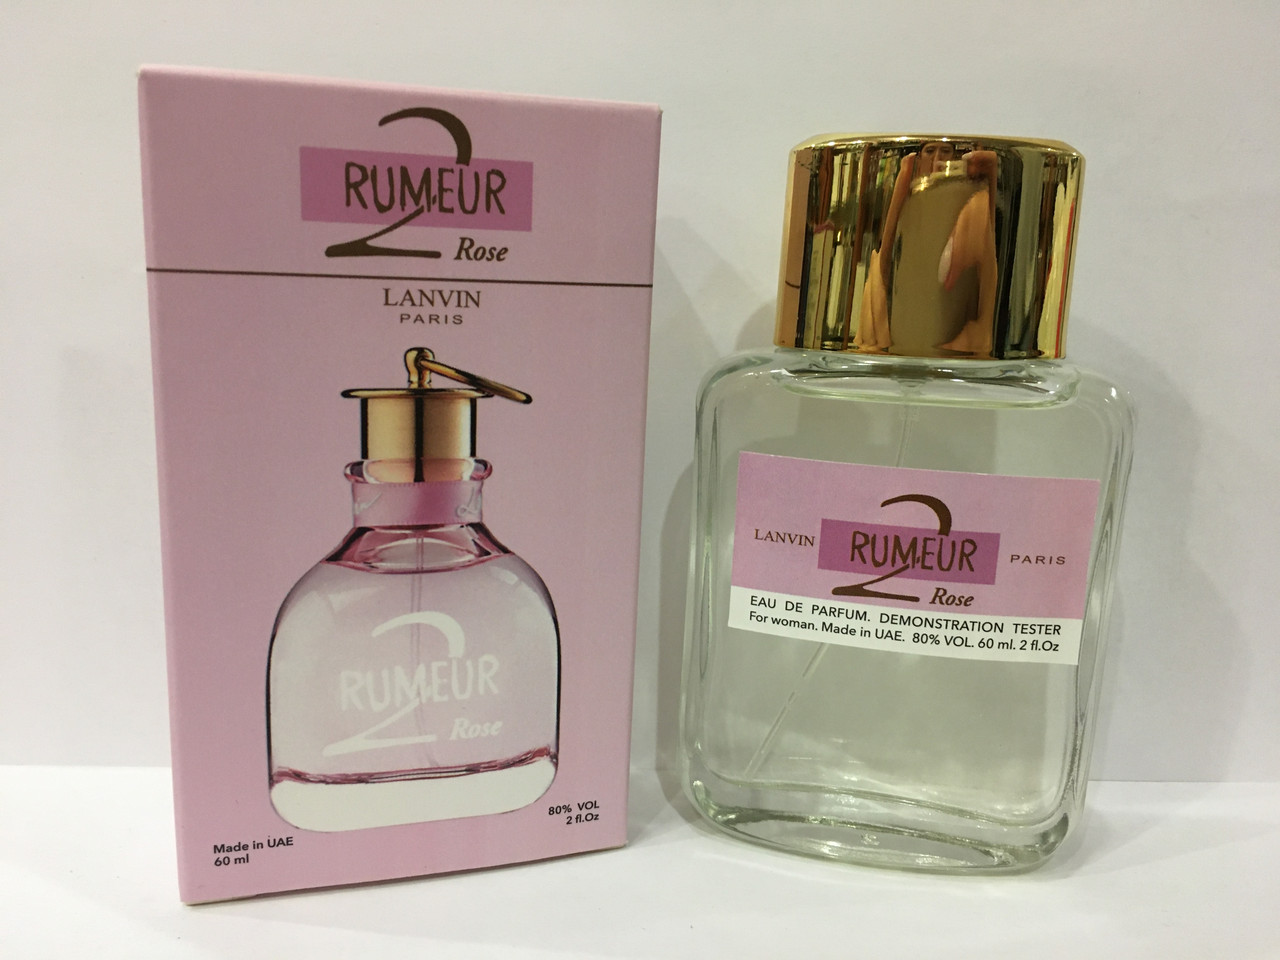 Женские духи мини тестер Lanvin Rumeur 2 Rose DutyFree 60 мл (Ланвин Румер 2 Роуз)